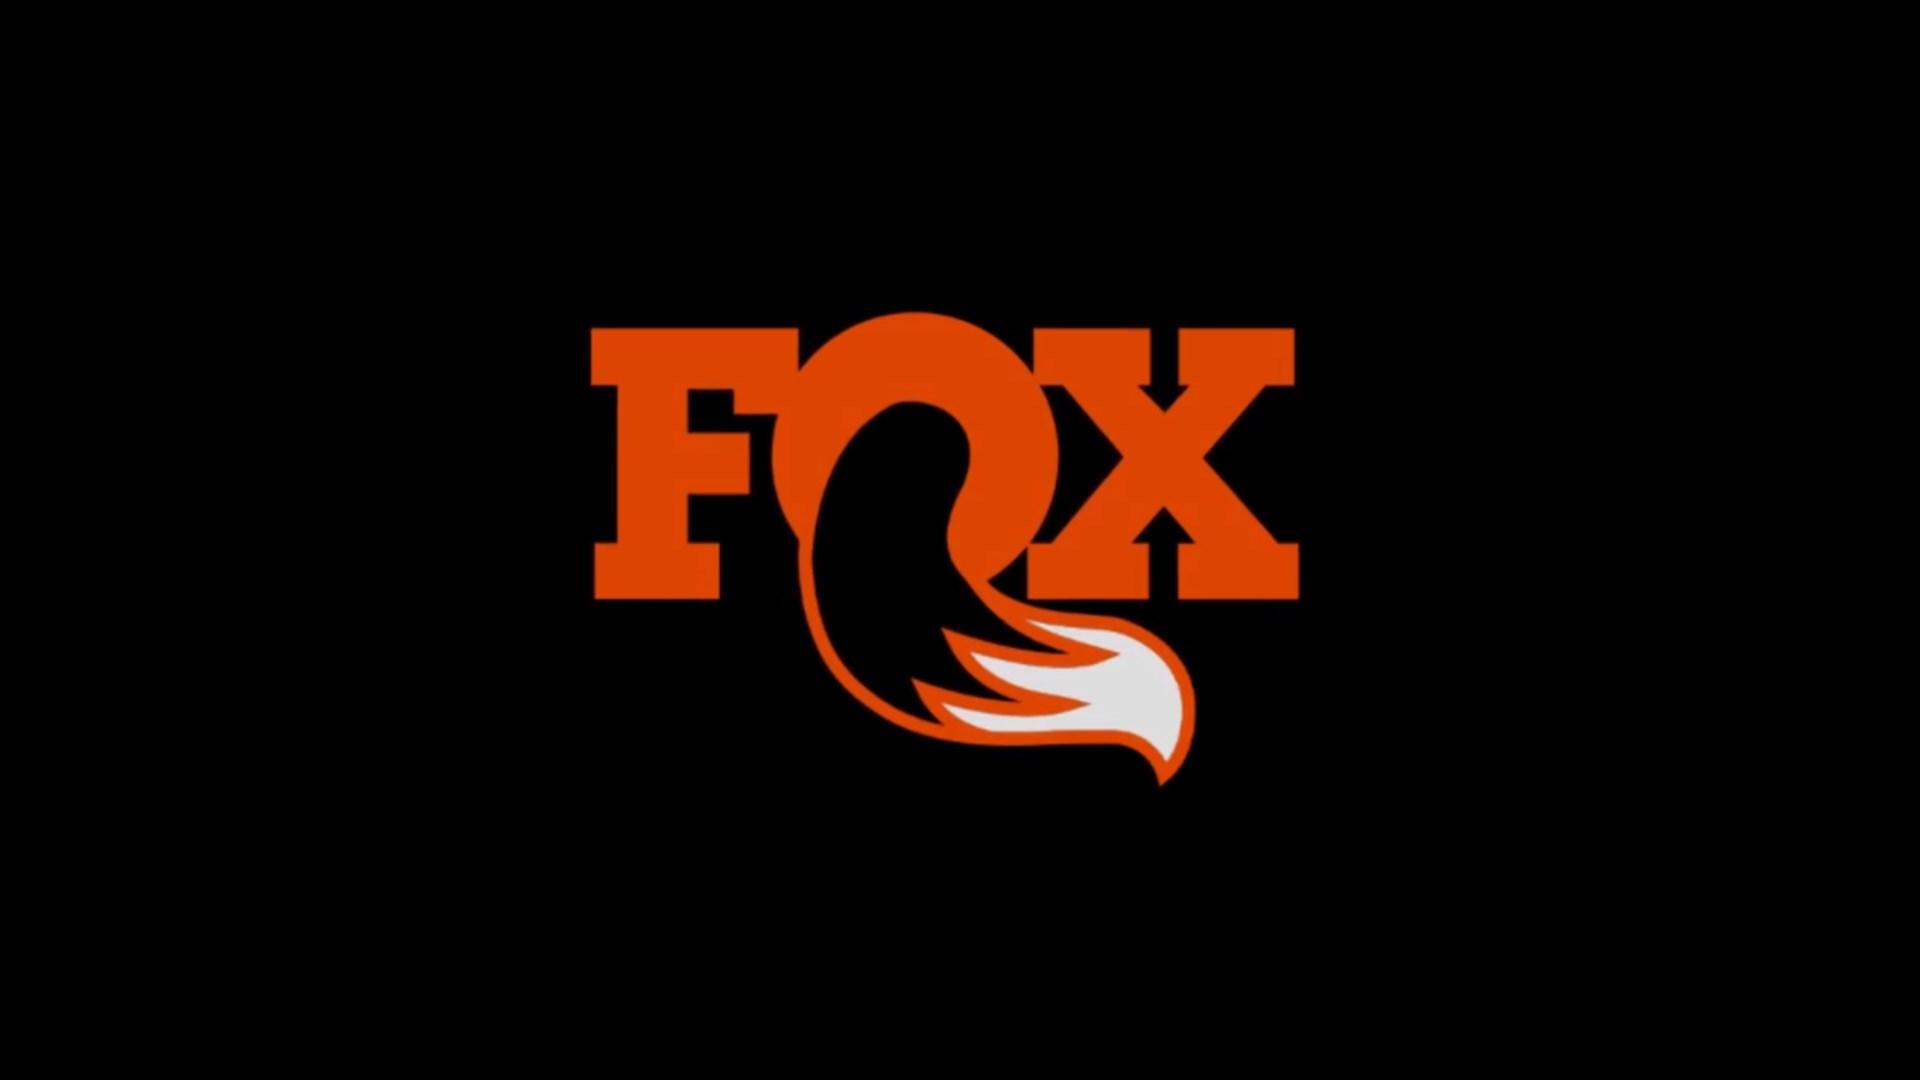 FOX DPS shock technology explained